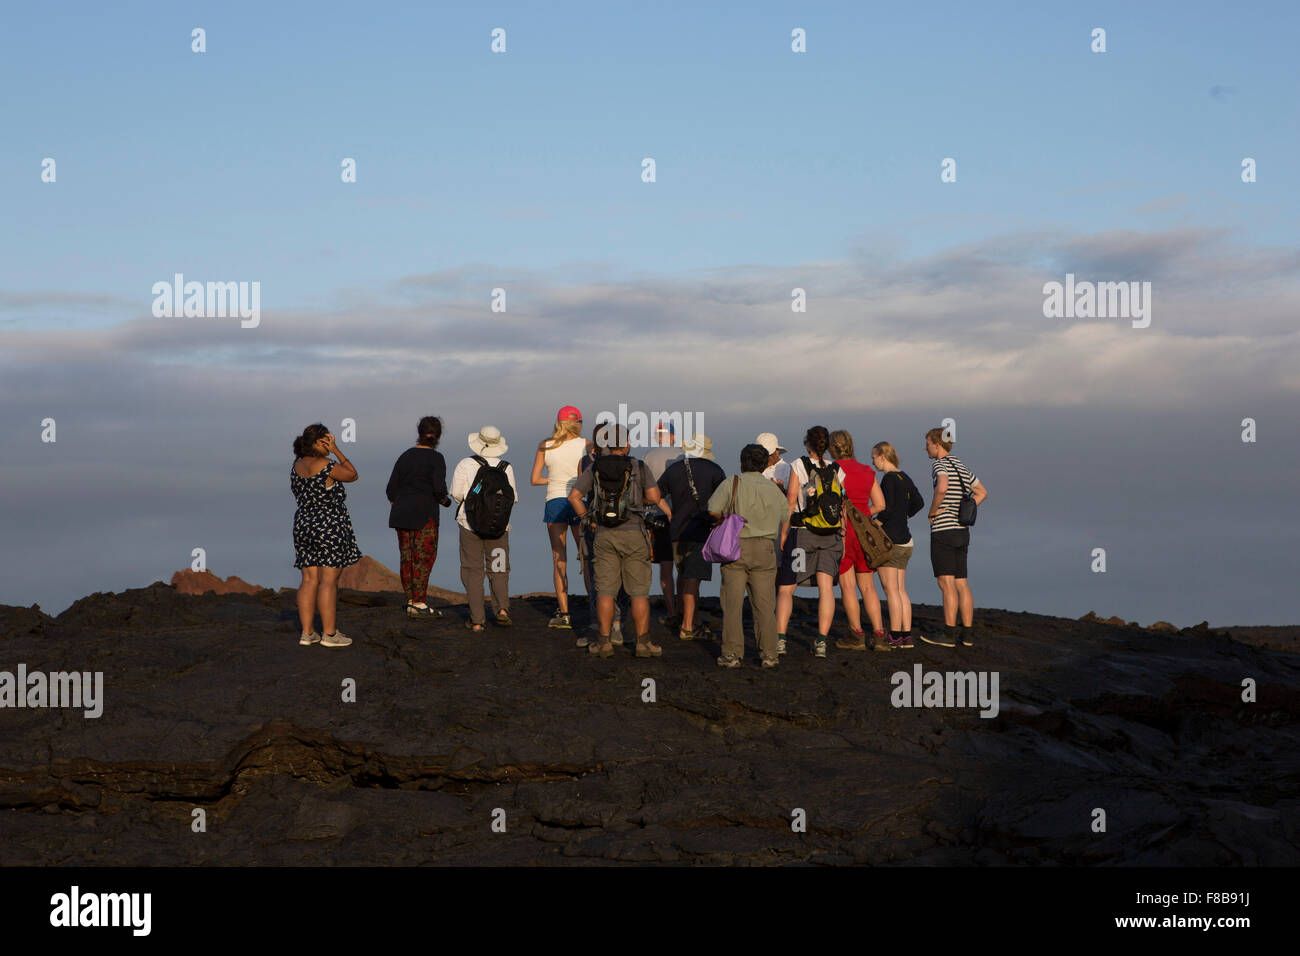 Tierwelt auf den Galapagos-Inseln, Ecuador. Touristen Stockbild